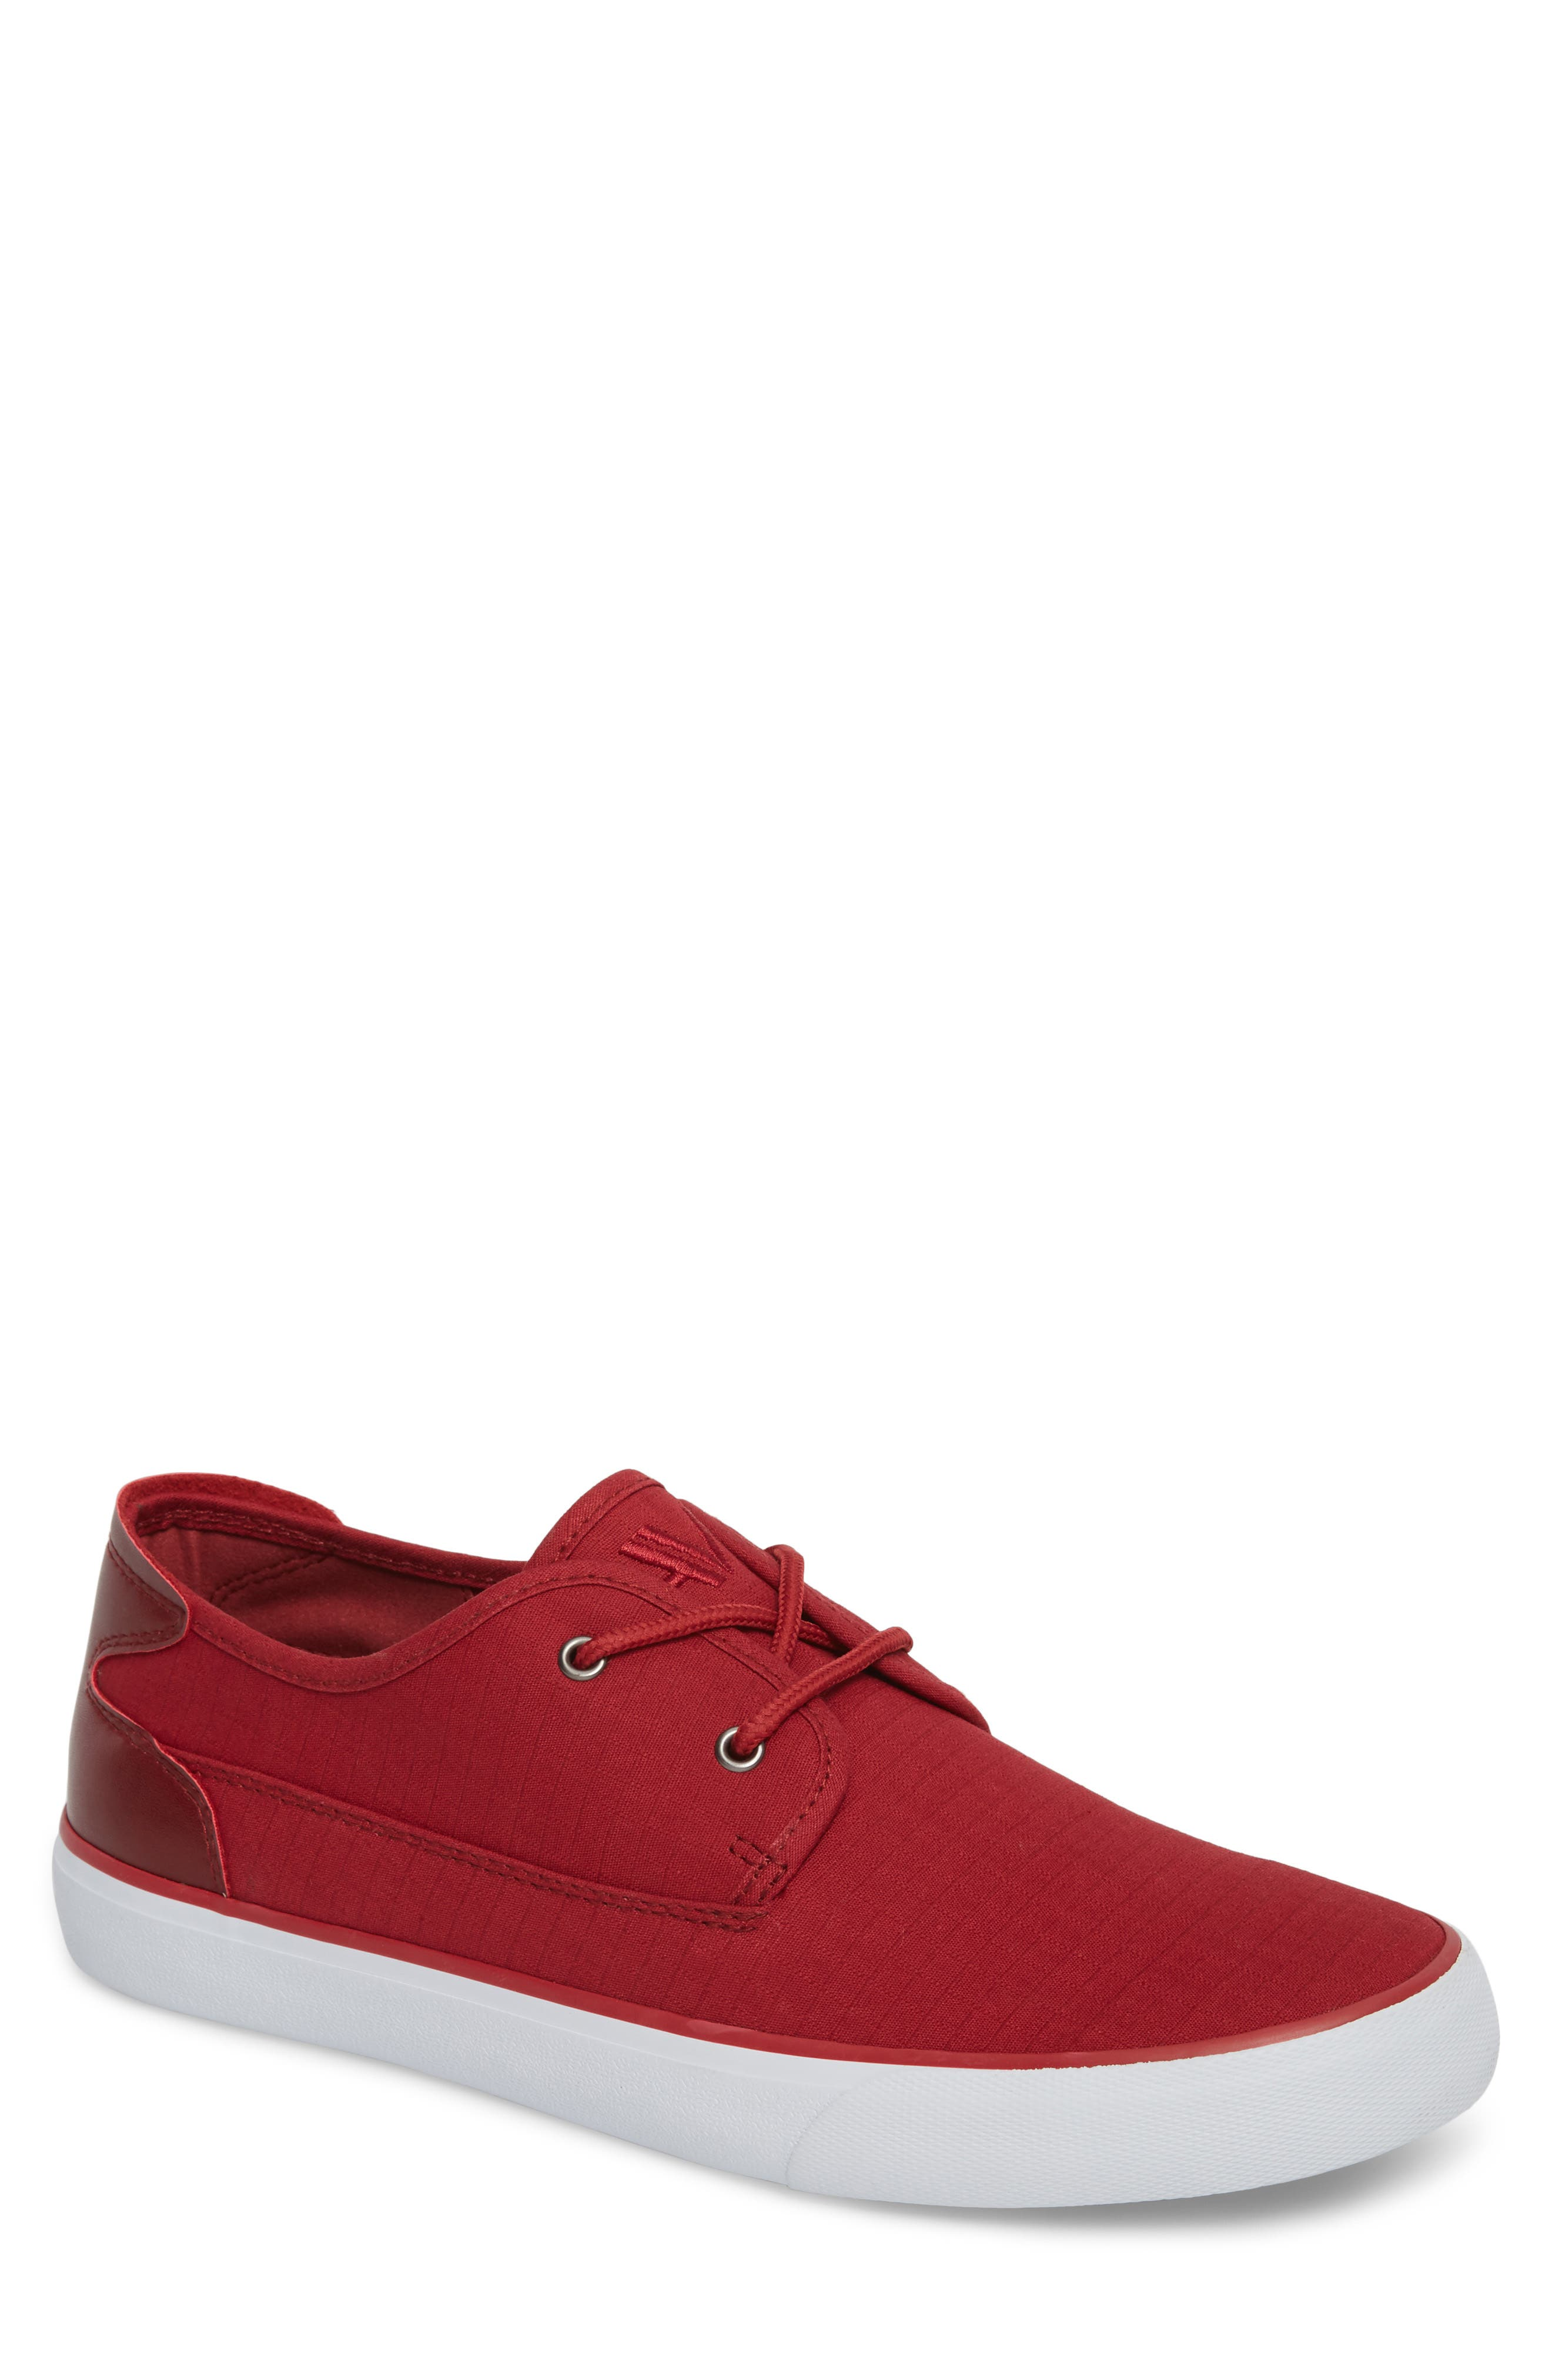 Morris Sneaker,                             Main thumbnail 1, color,                             RED/ WHITE